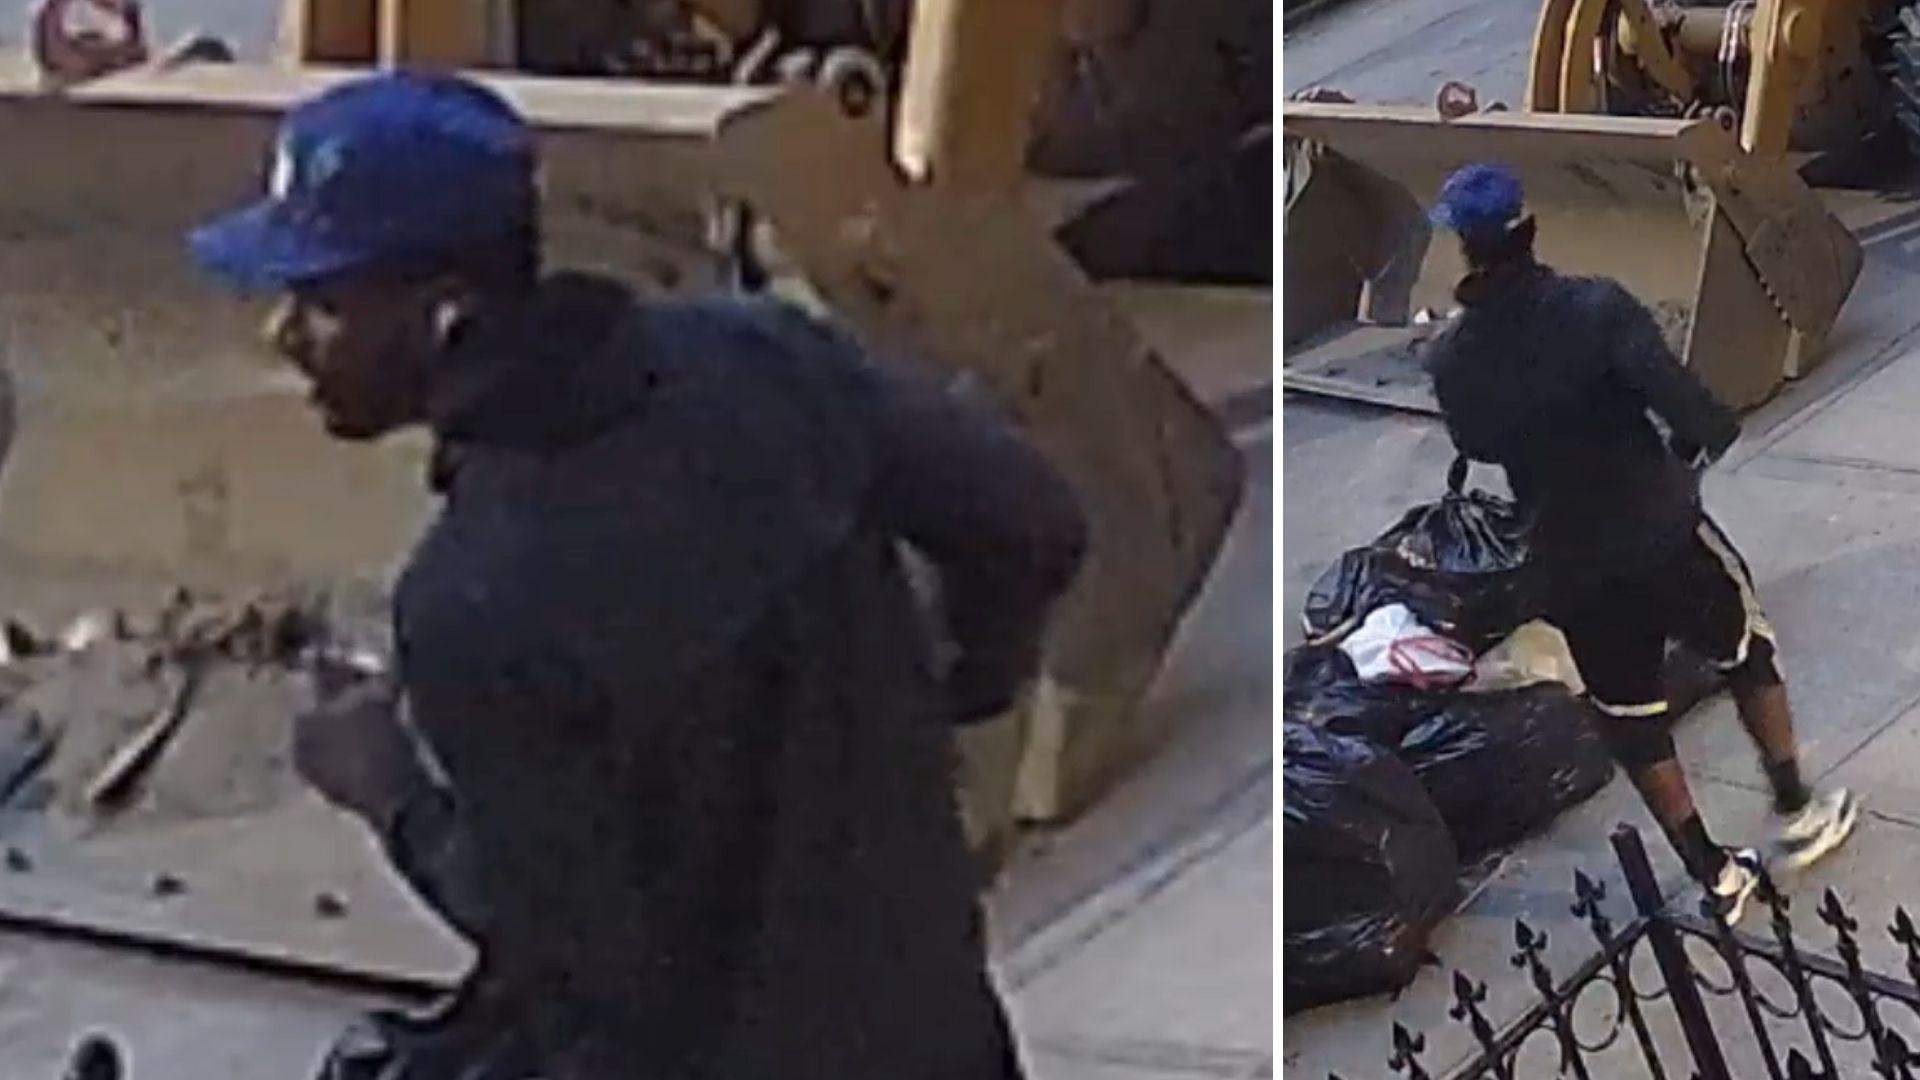 Suspect in violent Brooklyn mugging